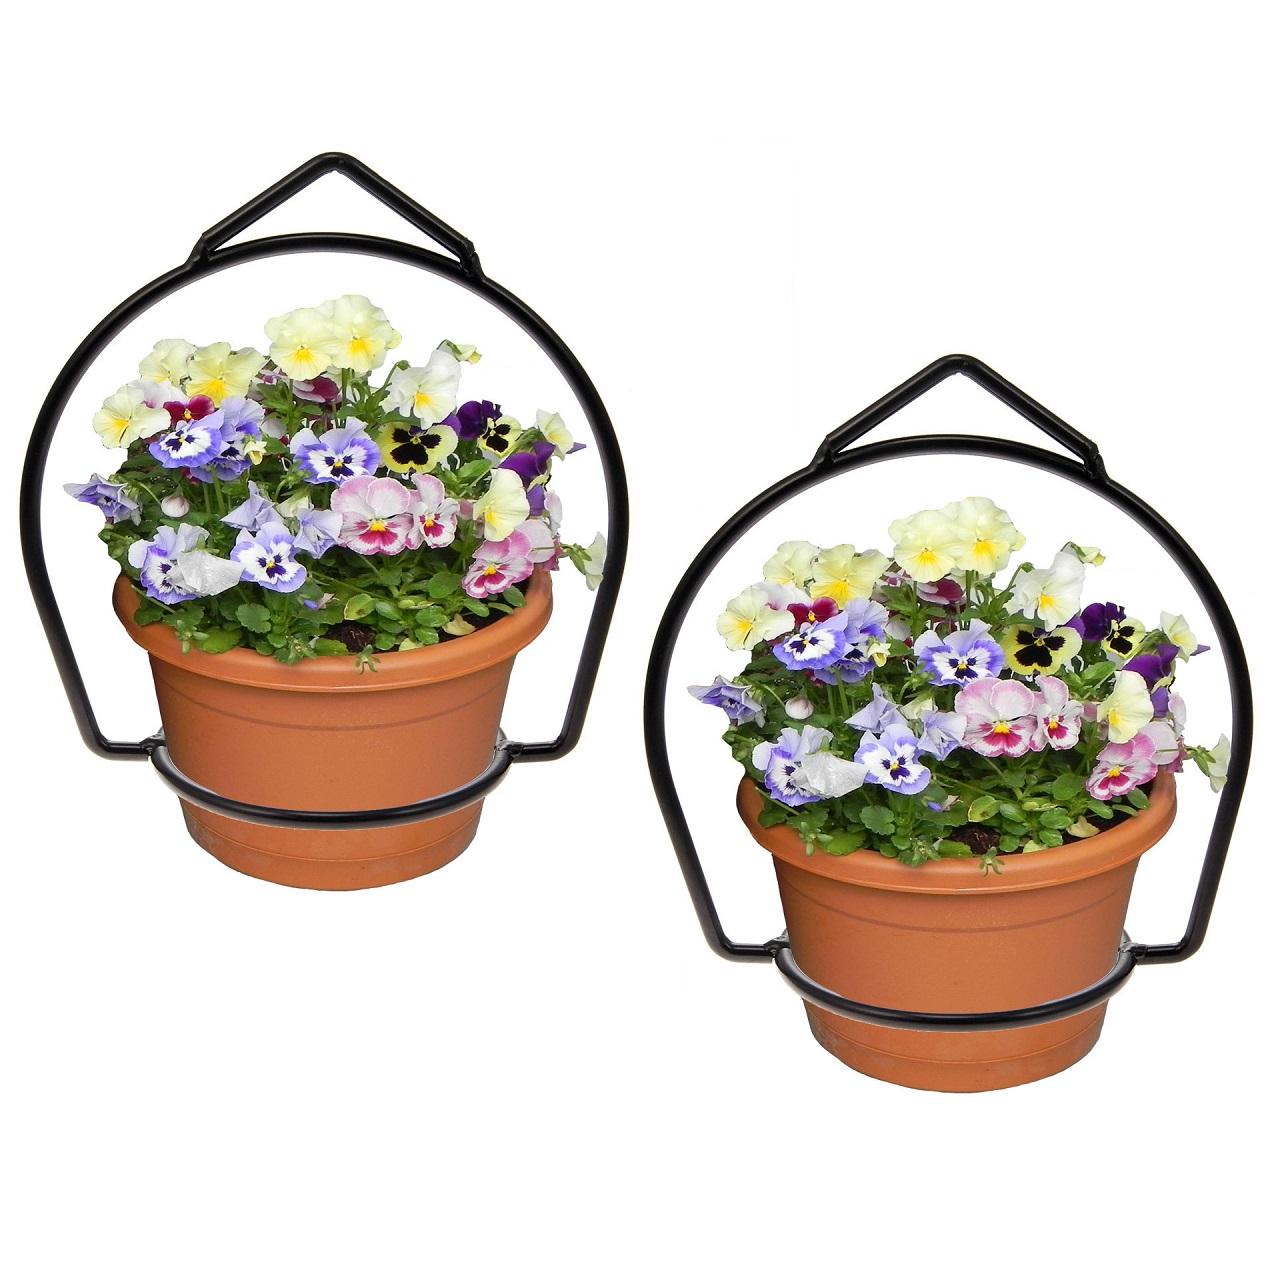 Brinkman Wrought Iron Flower Flower Pot Plant Hanger Ring Votive Holder Outdoor Hanging Basket